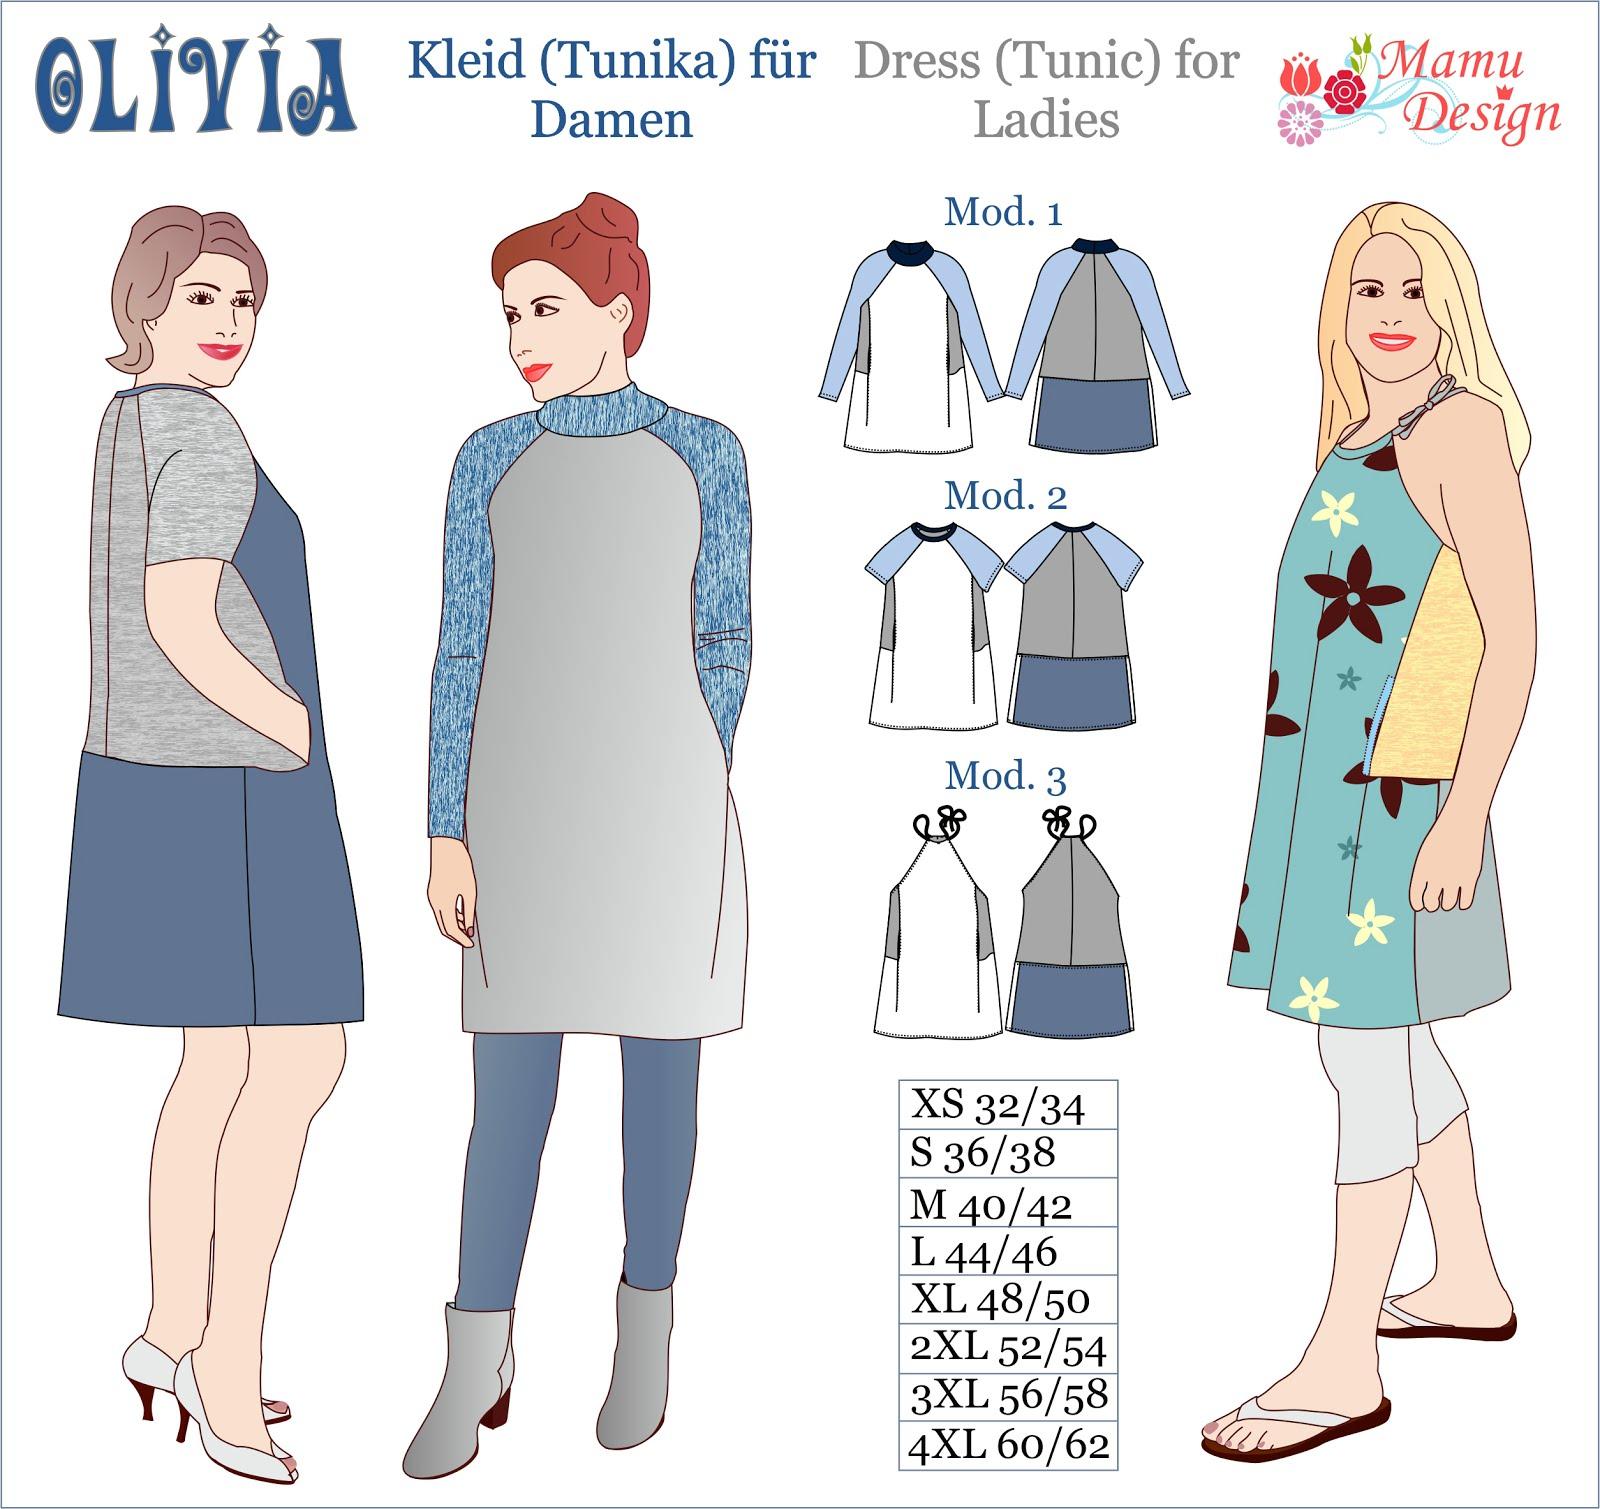 Mamu Design: ELIANA Schnittmuster für Tunika (Bluse) für Damen